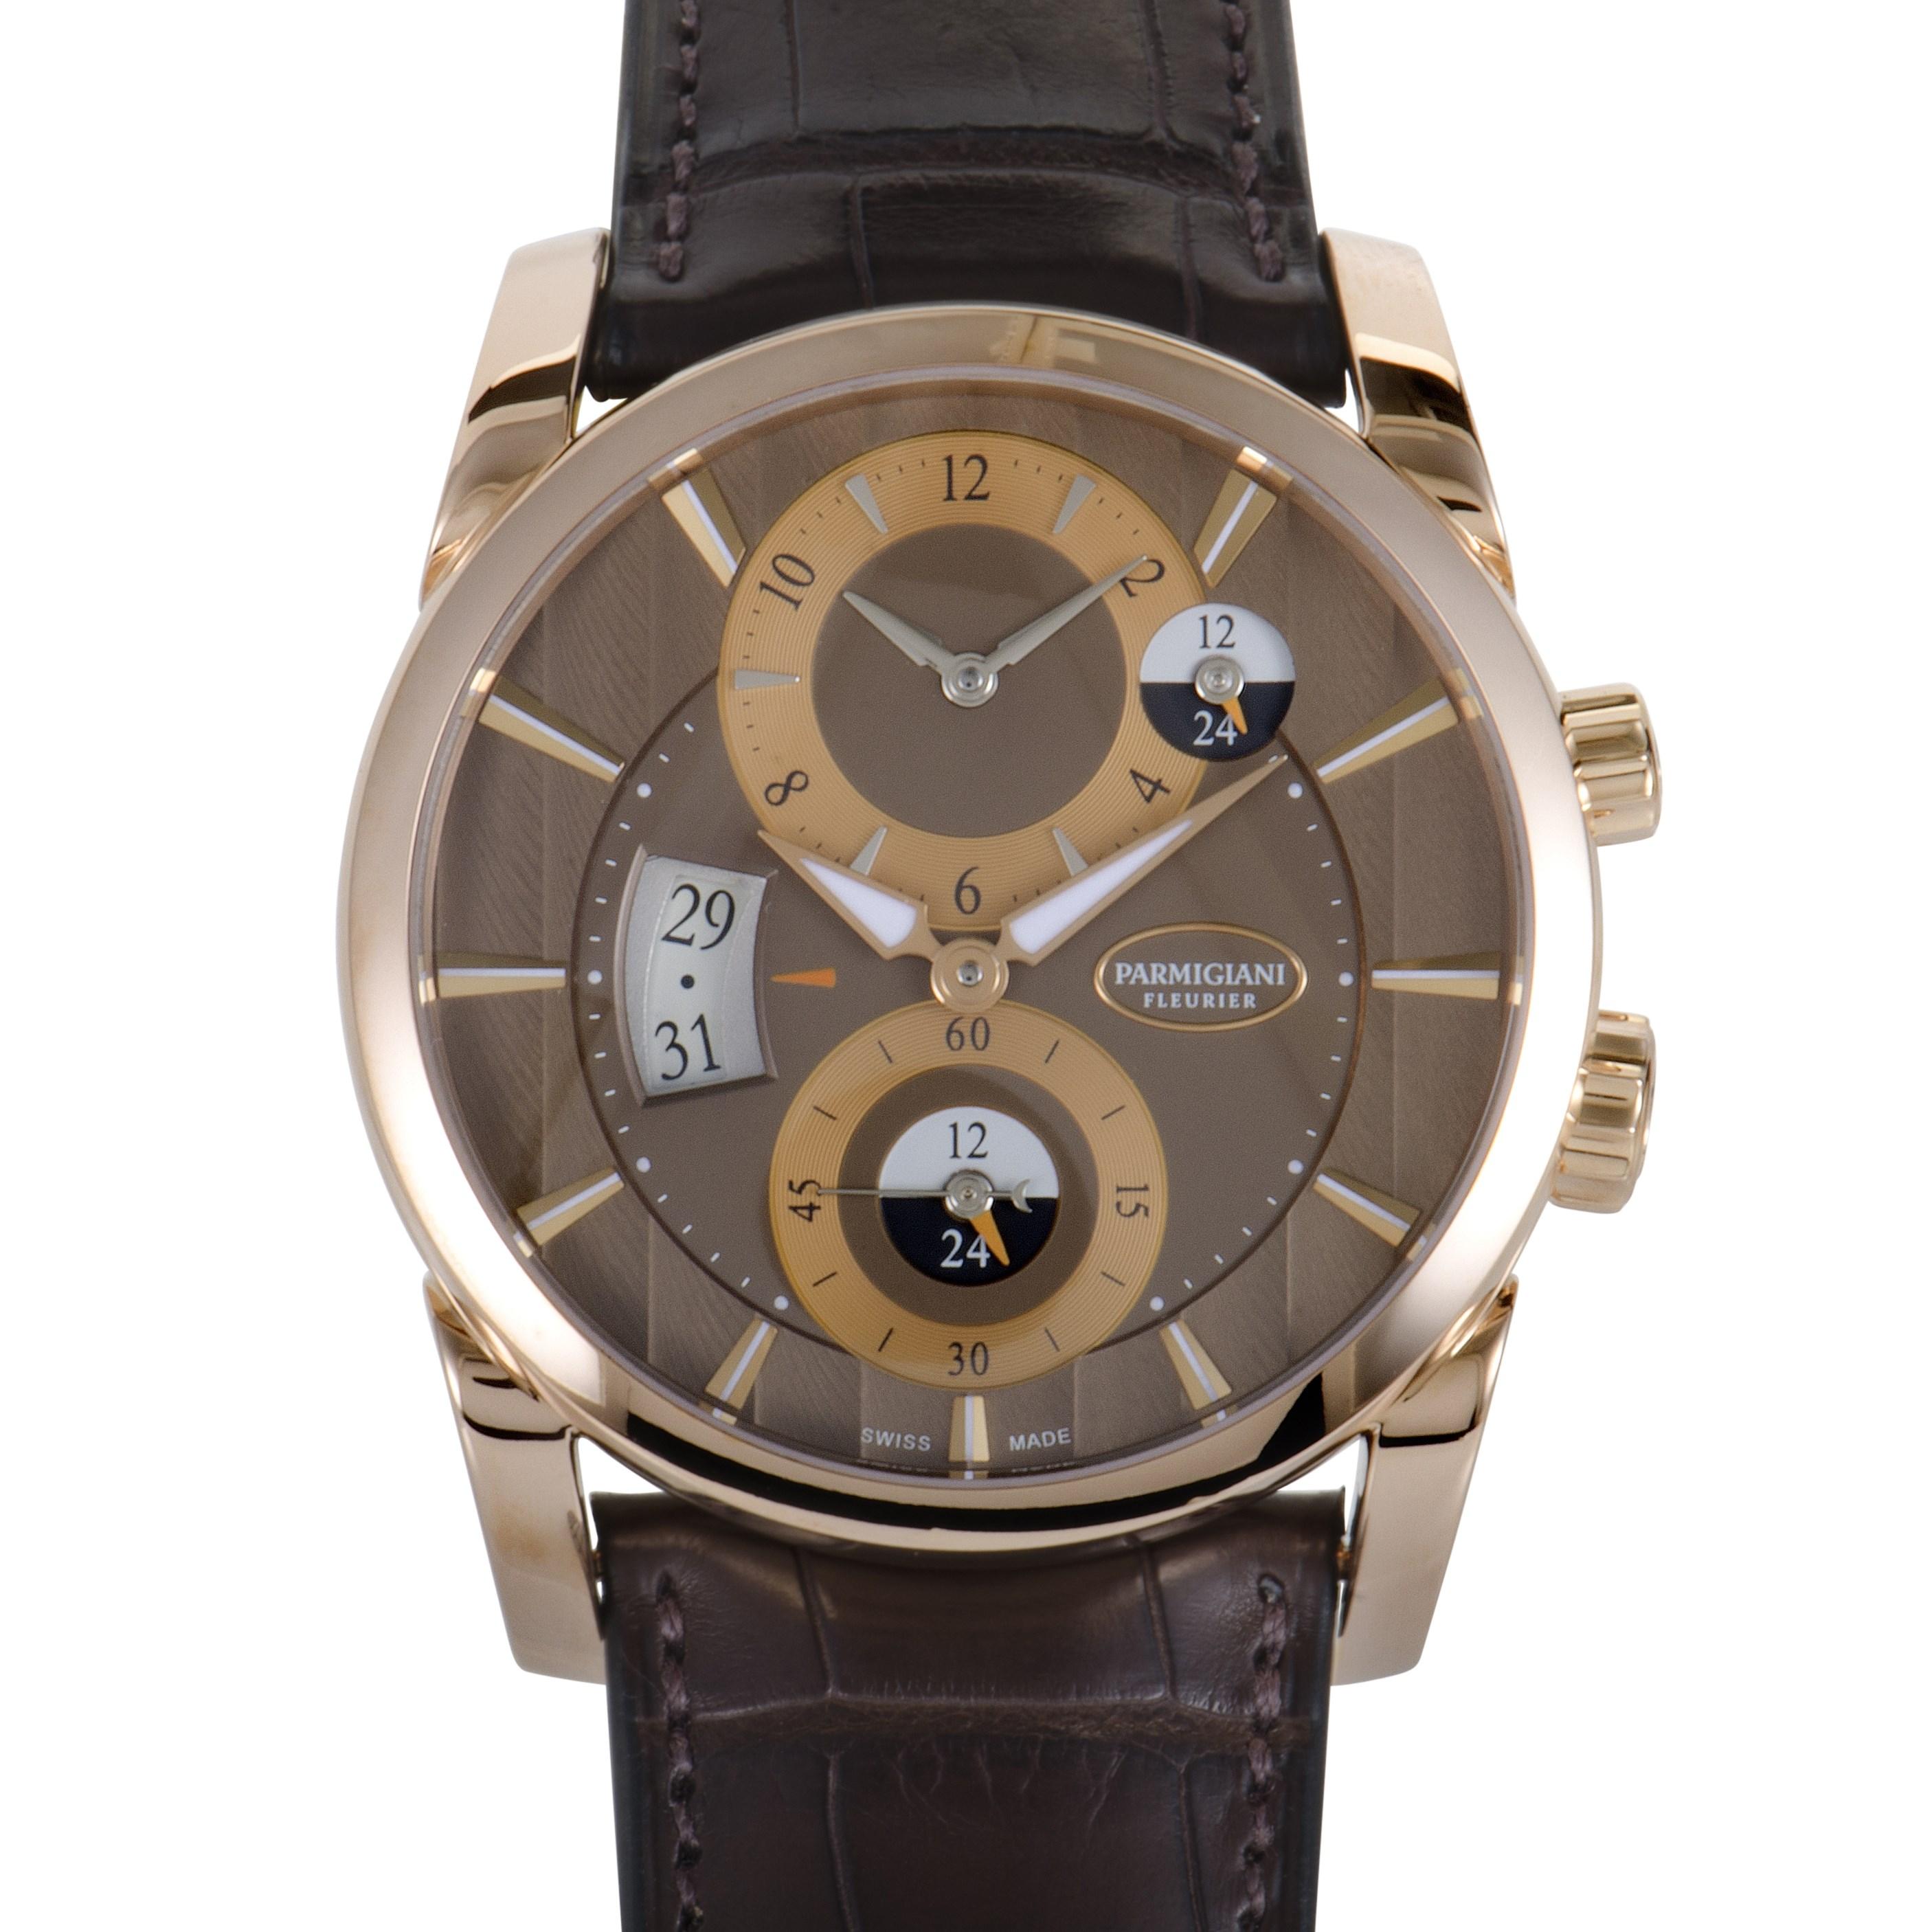 Tonda Hémisphères Automatic Watch PFC231-1001200-HA1242